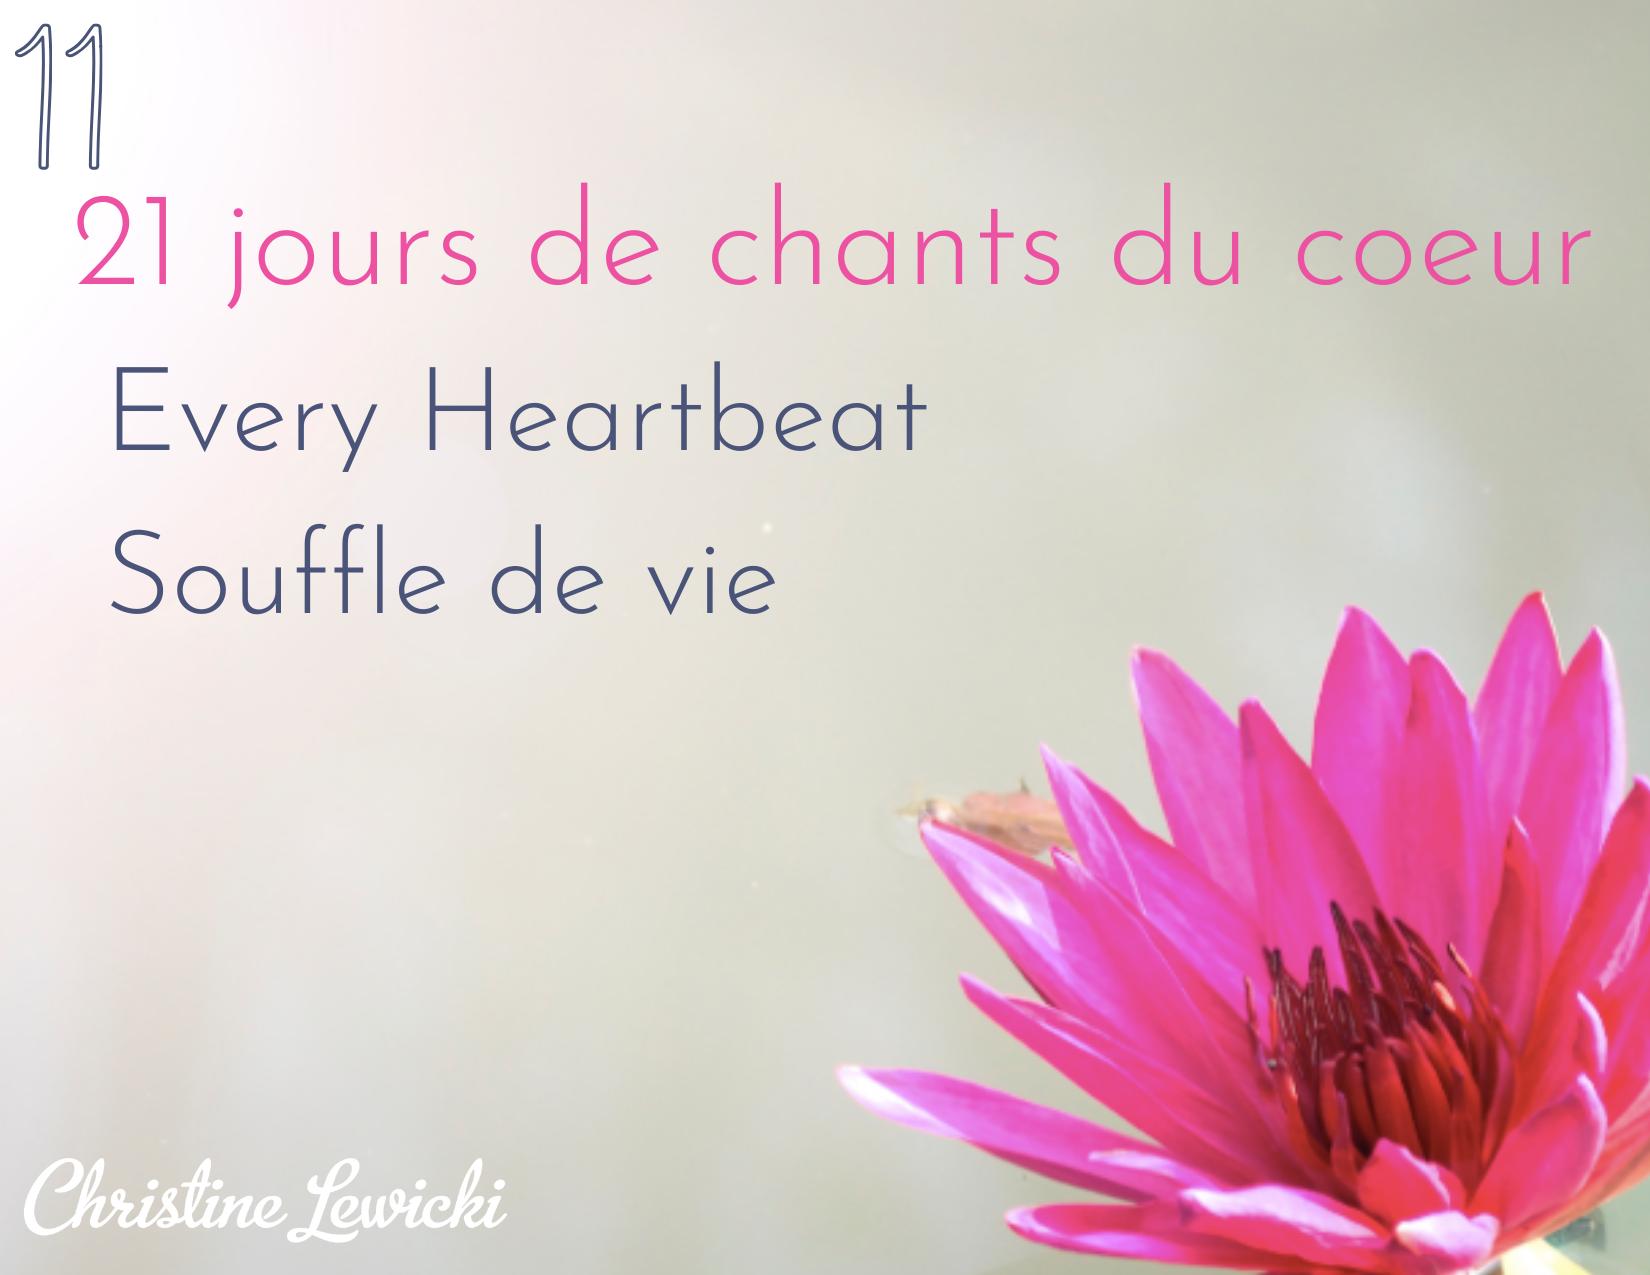 Every Heartbeat, par Snatam Kaur